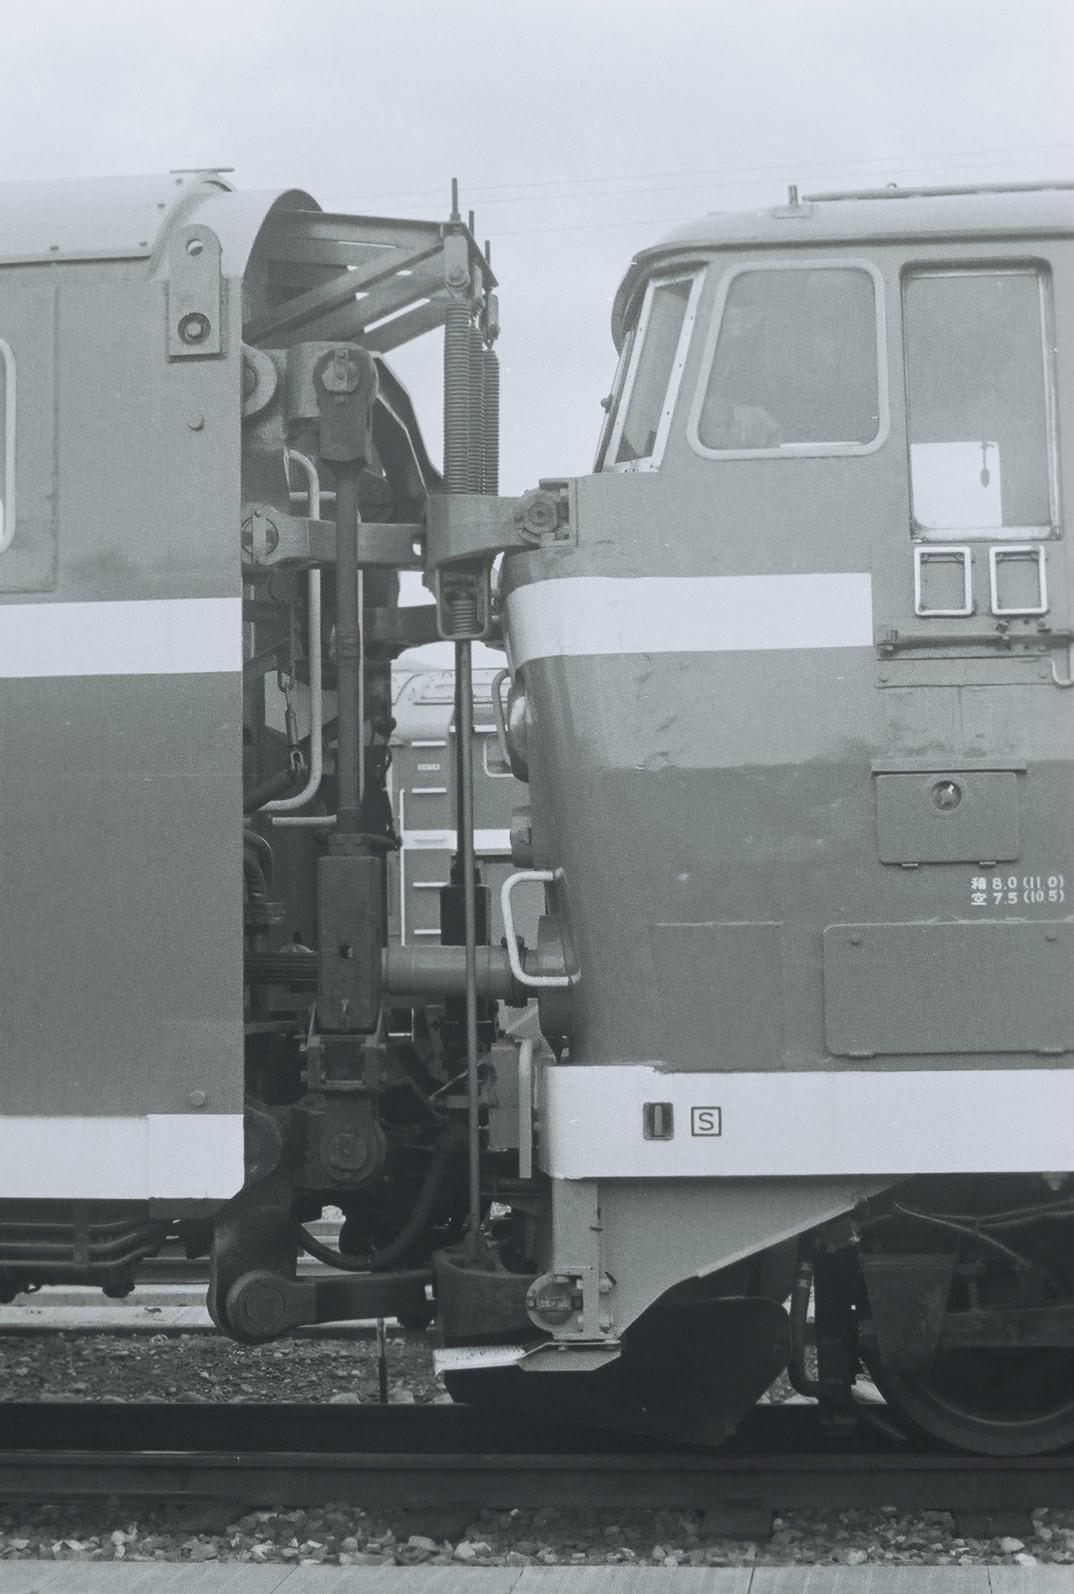 197810051125